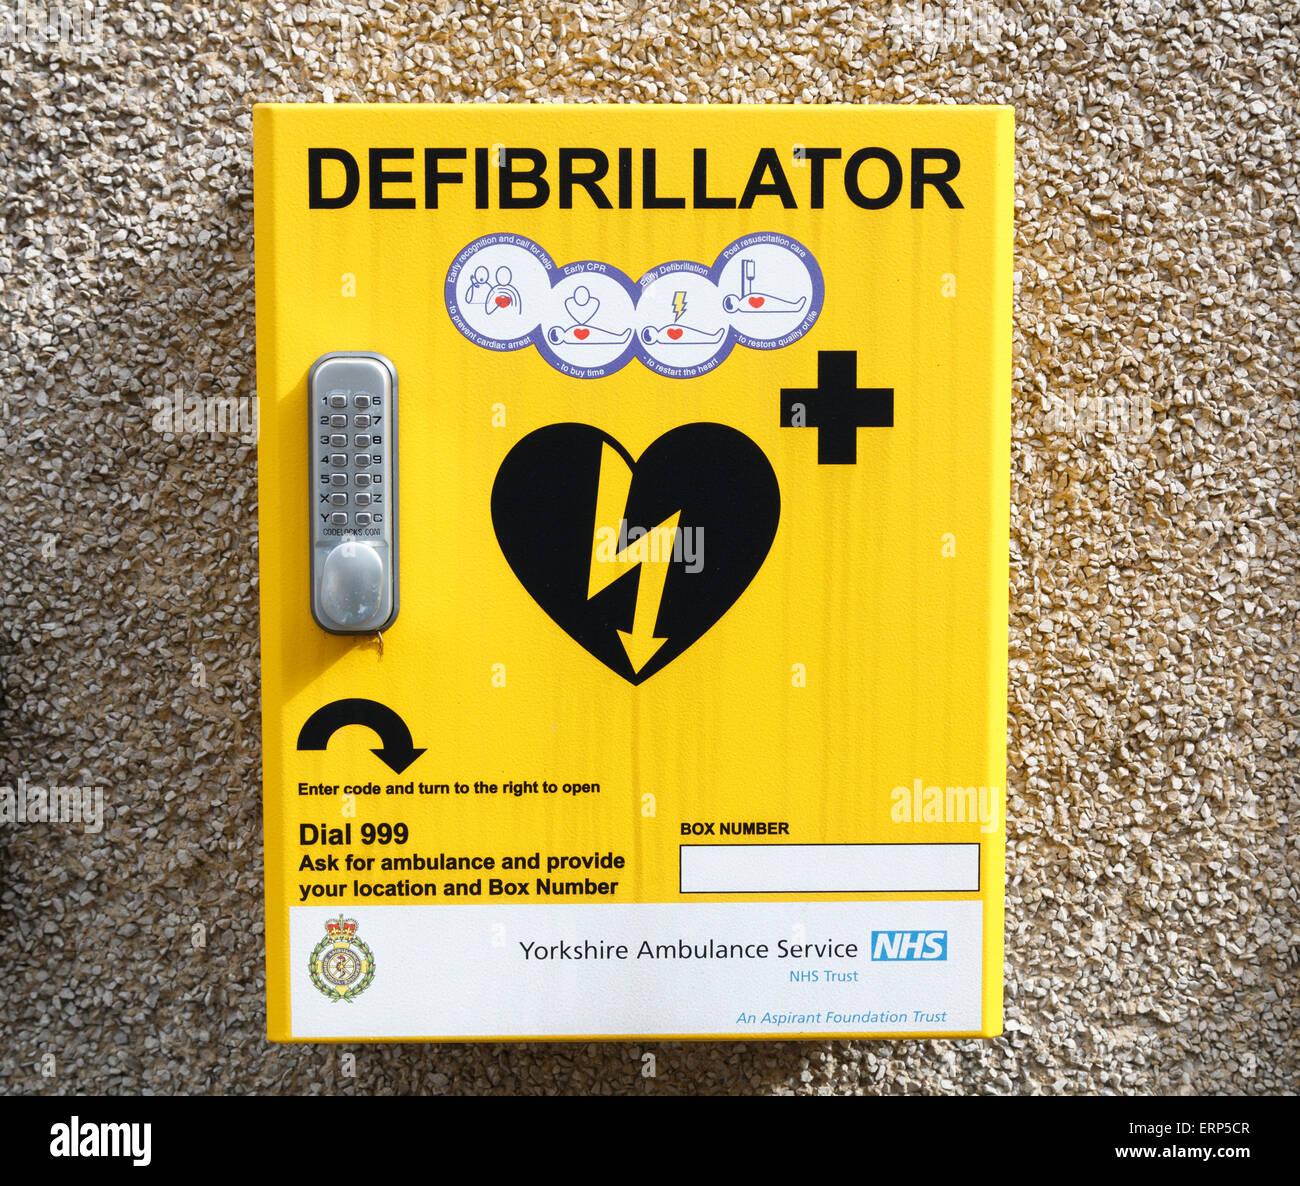 Defibrillator for public use. - Stock Image